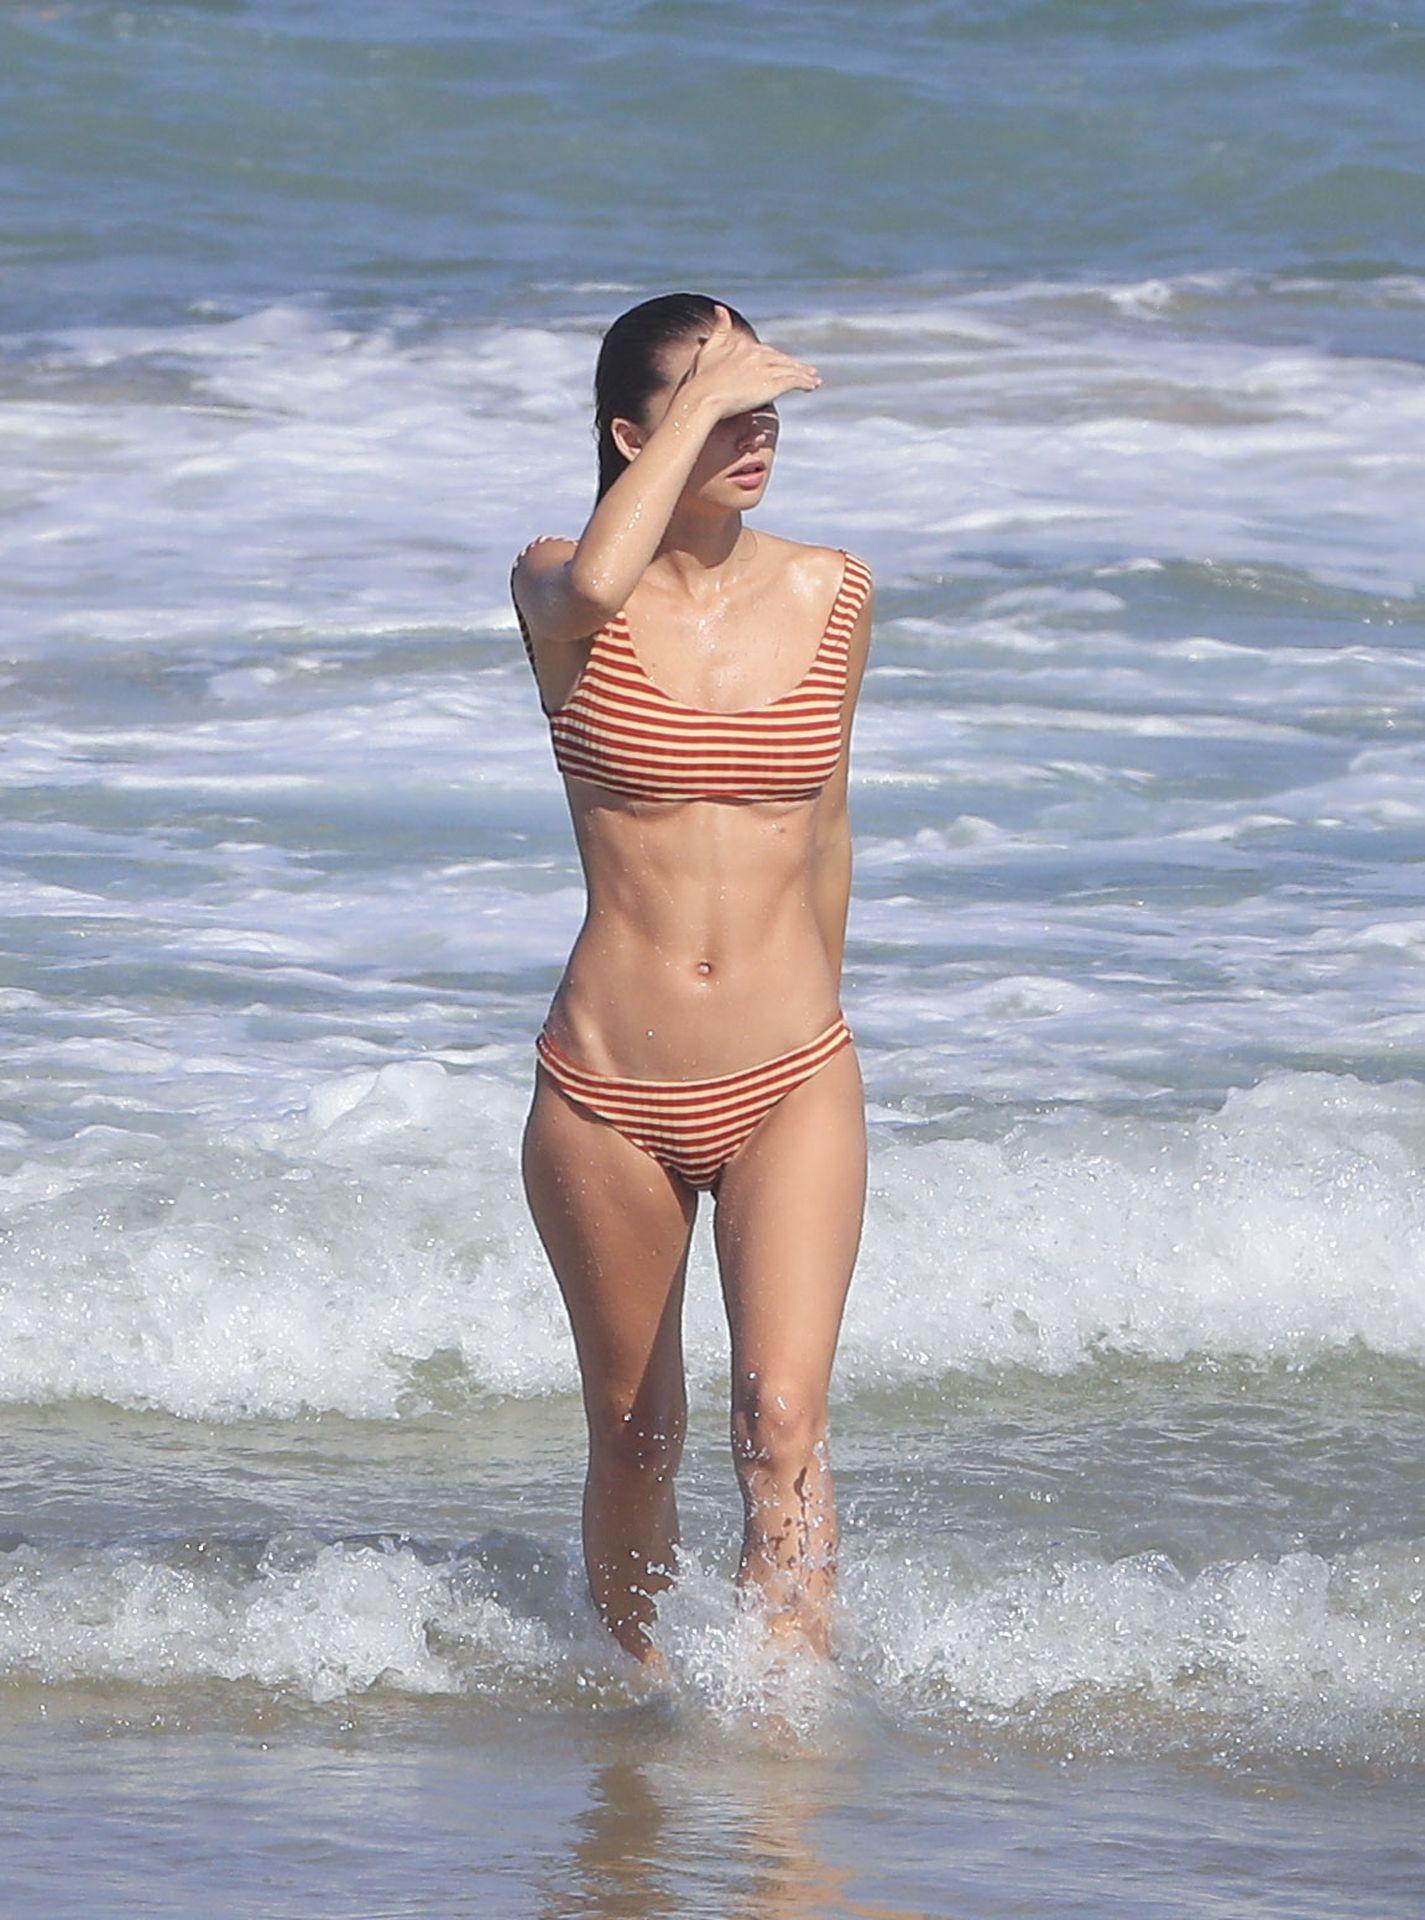 Gabriella Brooks Hot – Liam Hemsworth's New Girlfriend 0039